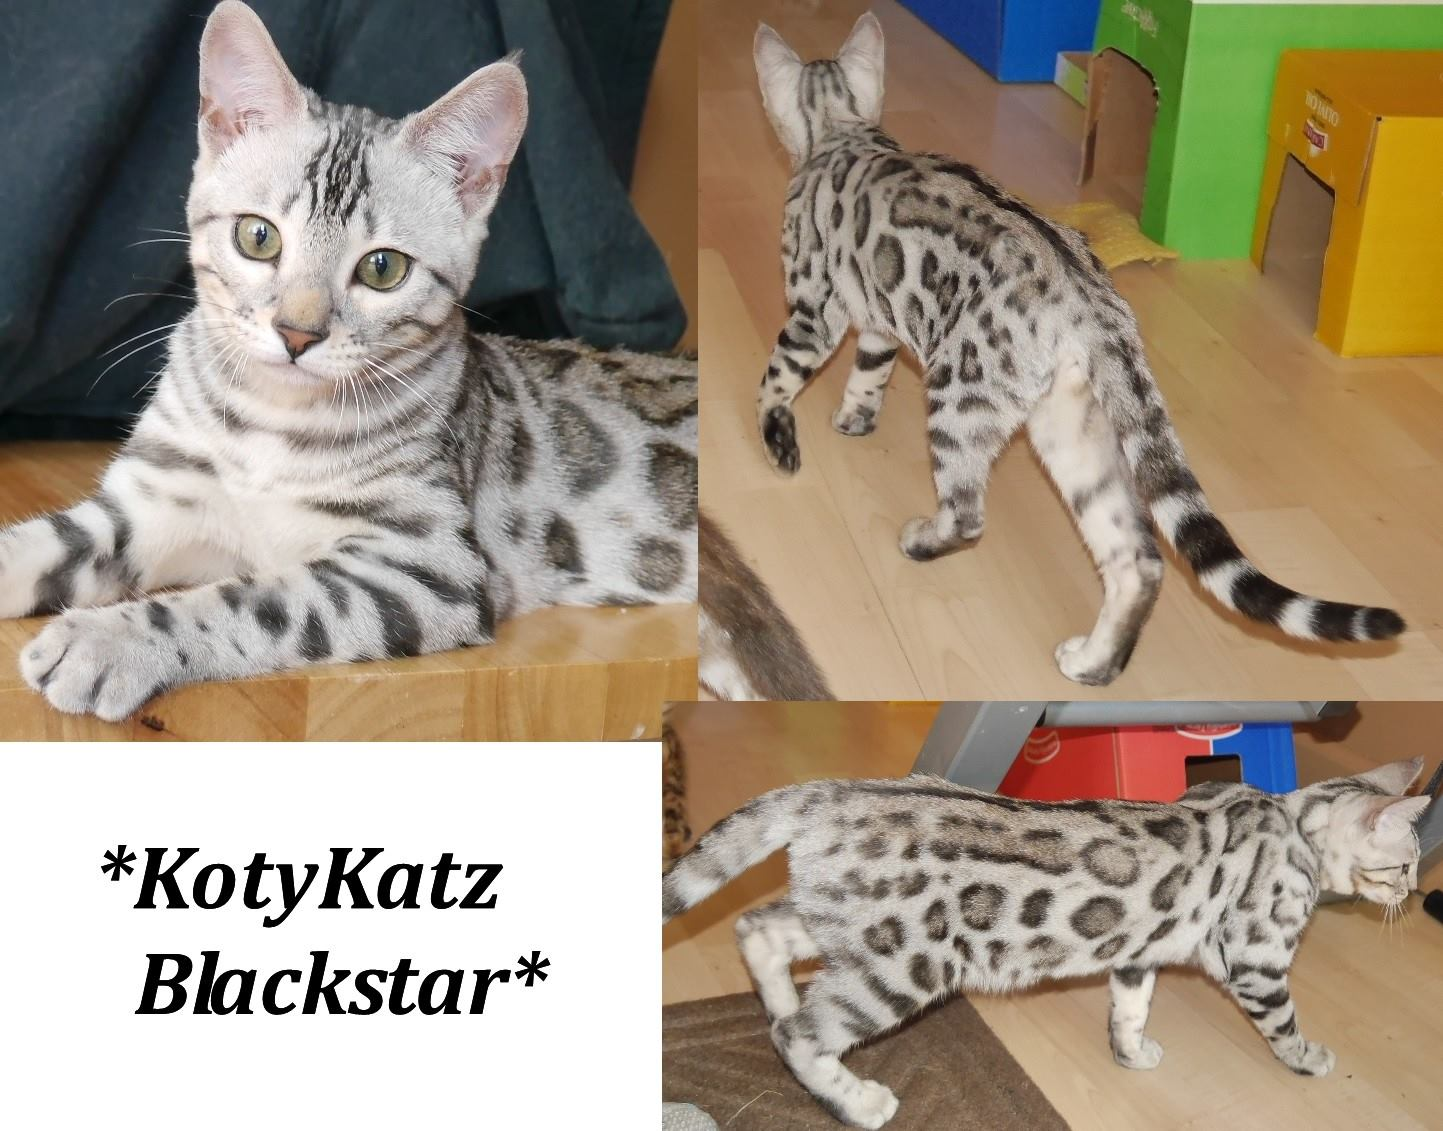 KotyKatz Blackstar